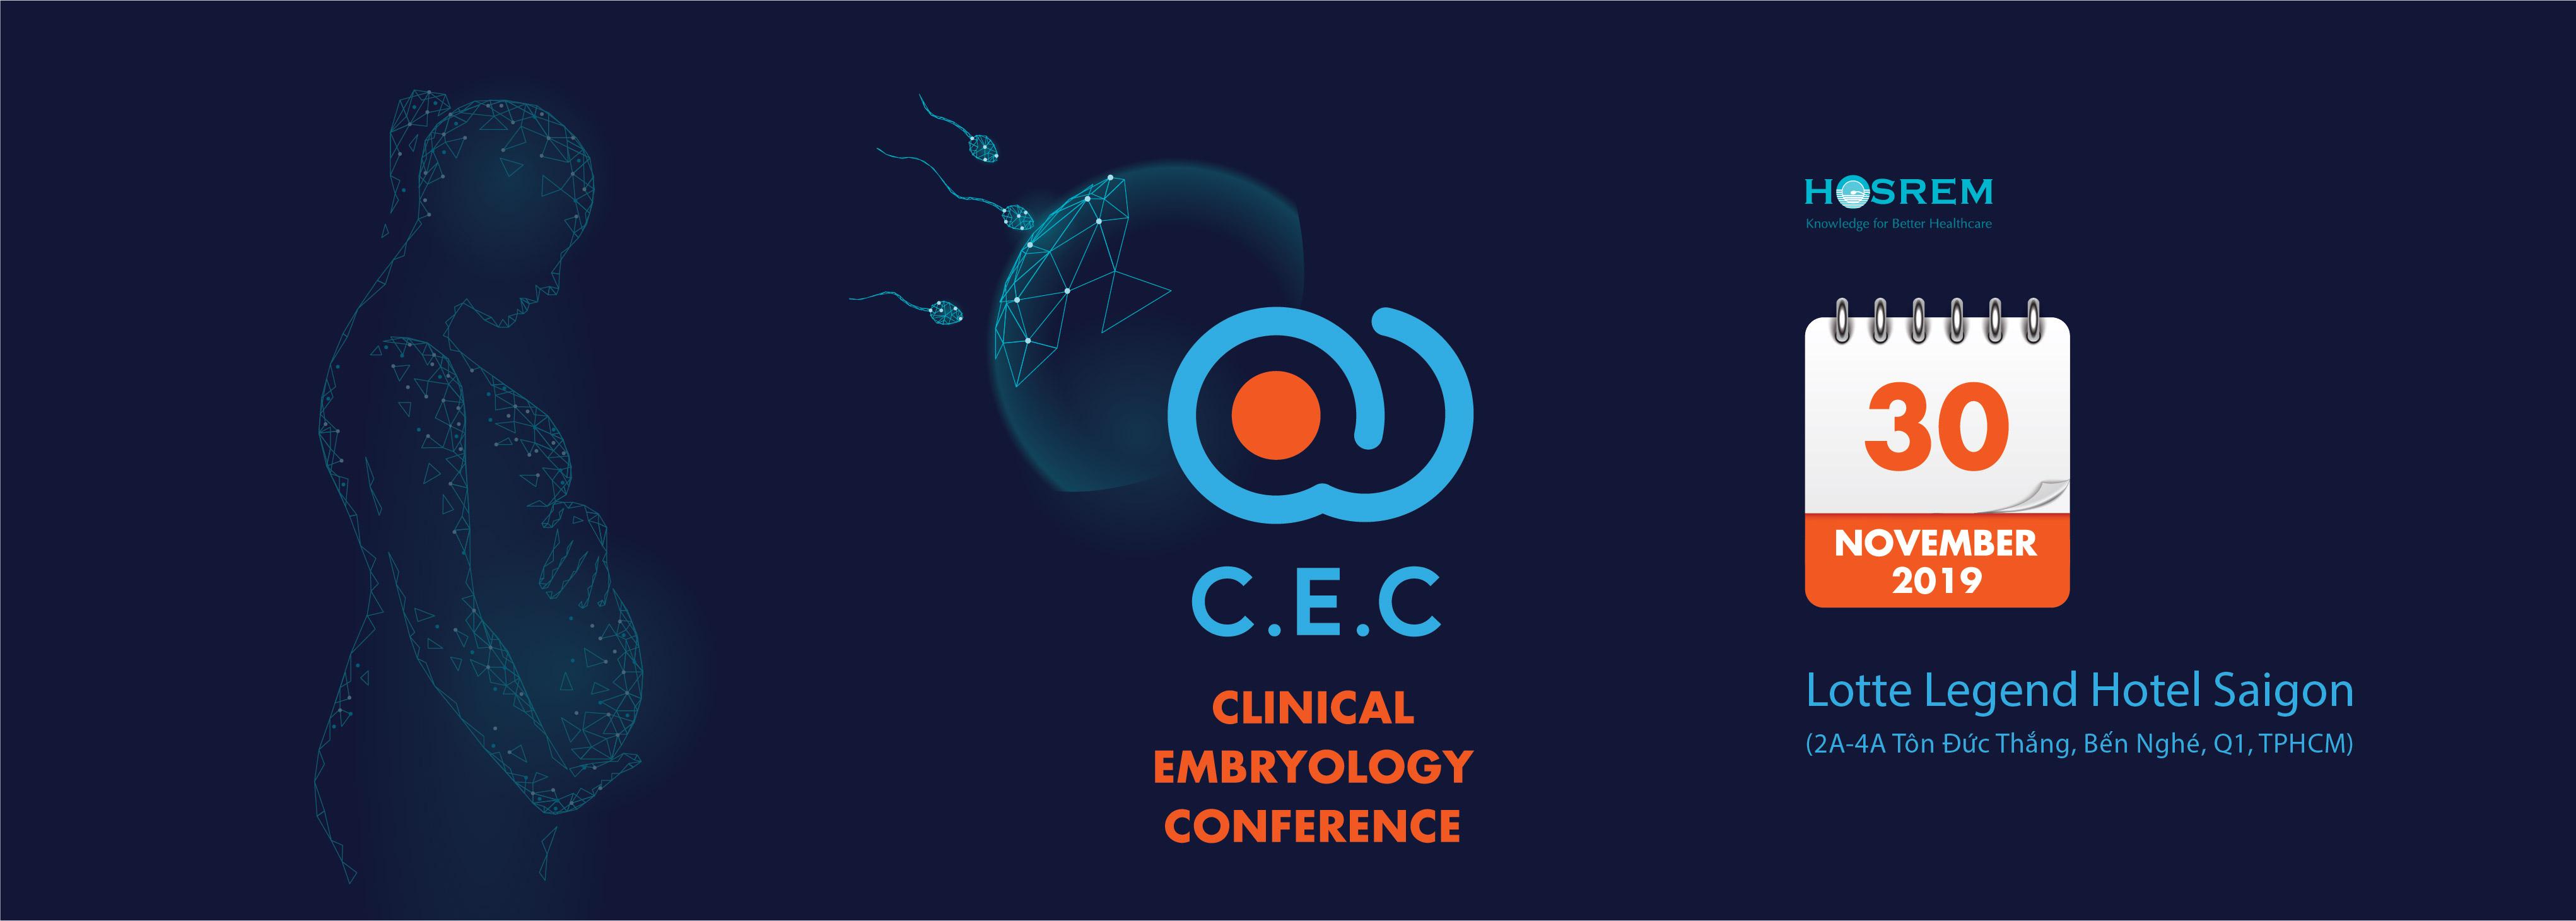 Chương trình CEC – Clinical Embryology Conference 2019